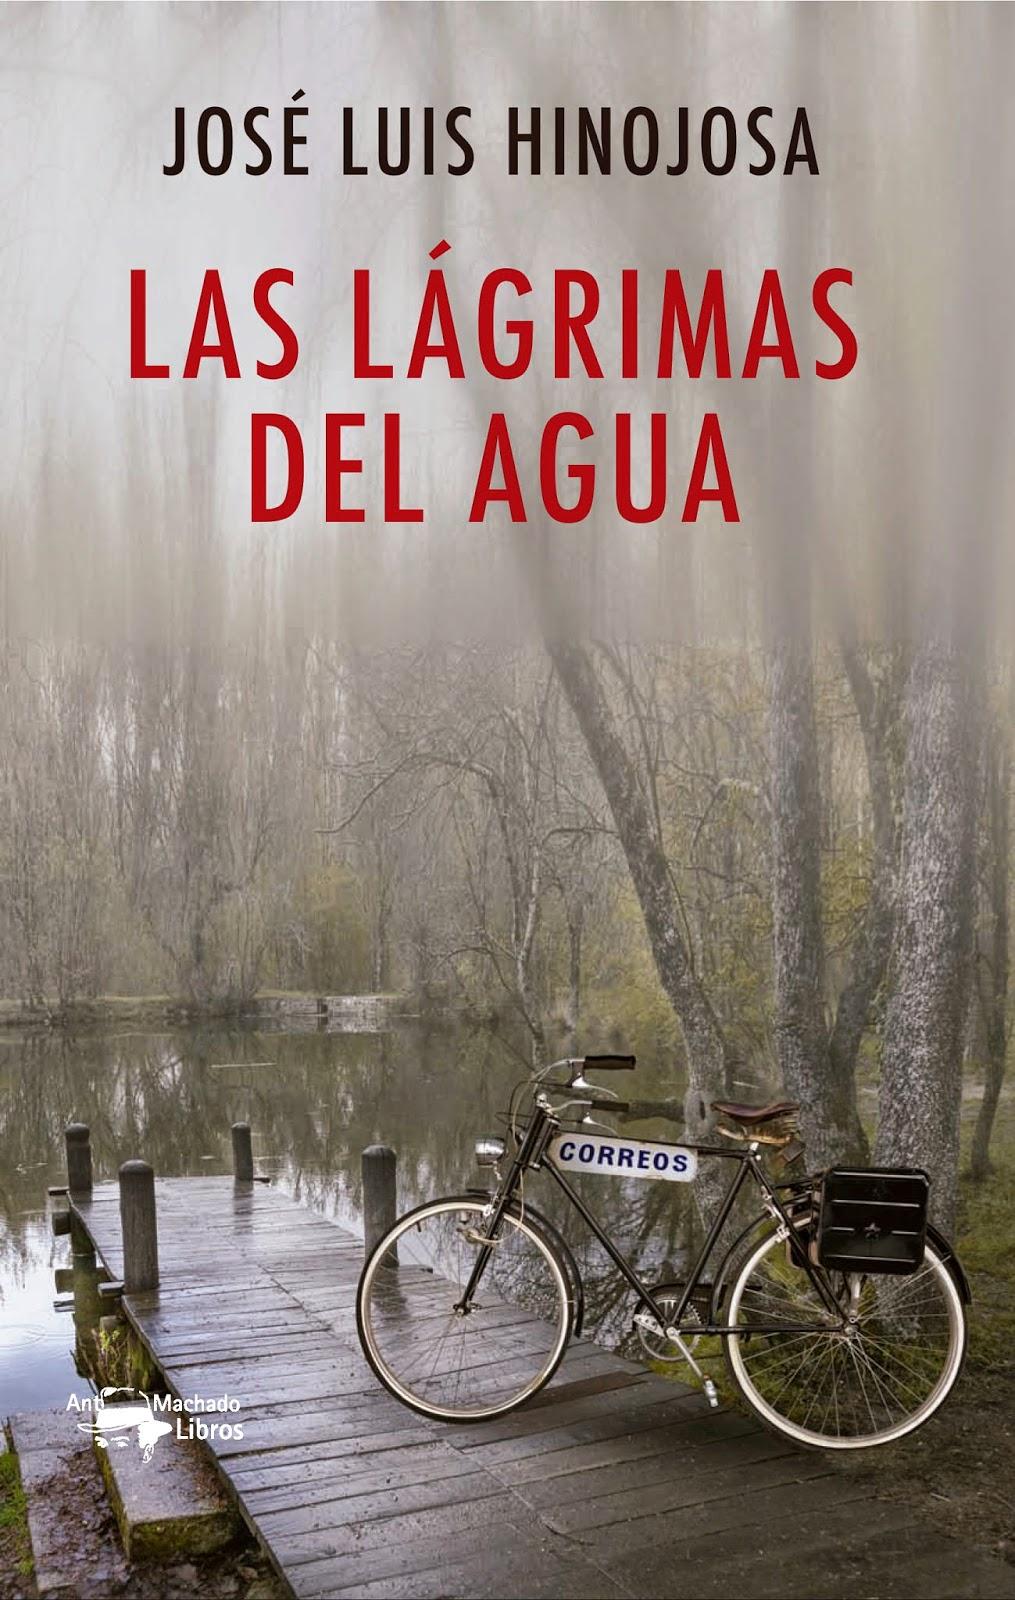 http://almastintadas.blogspot.com.es/2014/10/las-lagrimas-del-agua.html